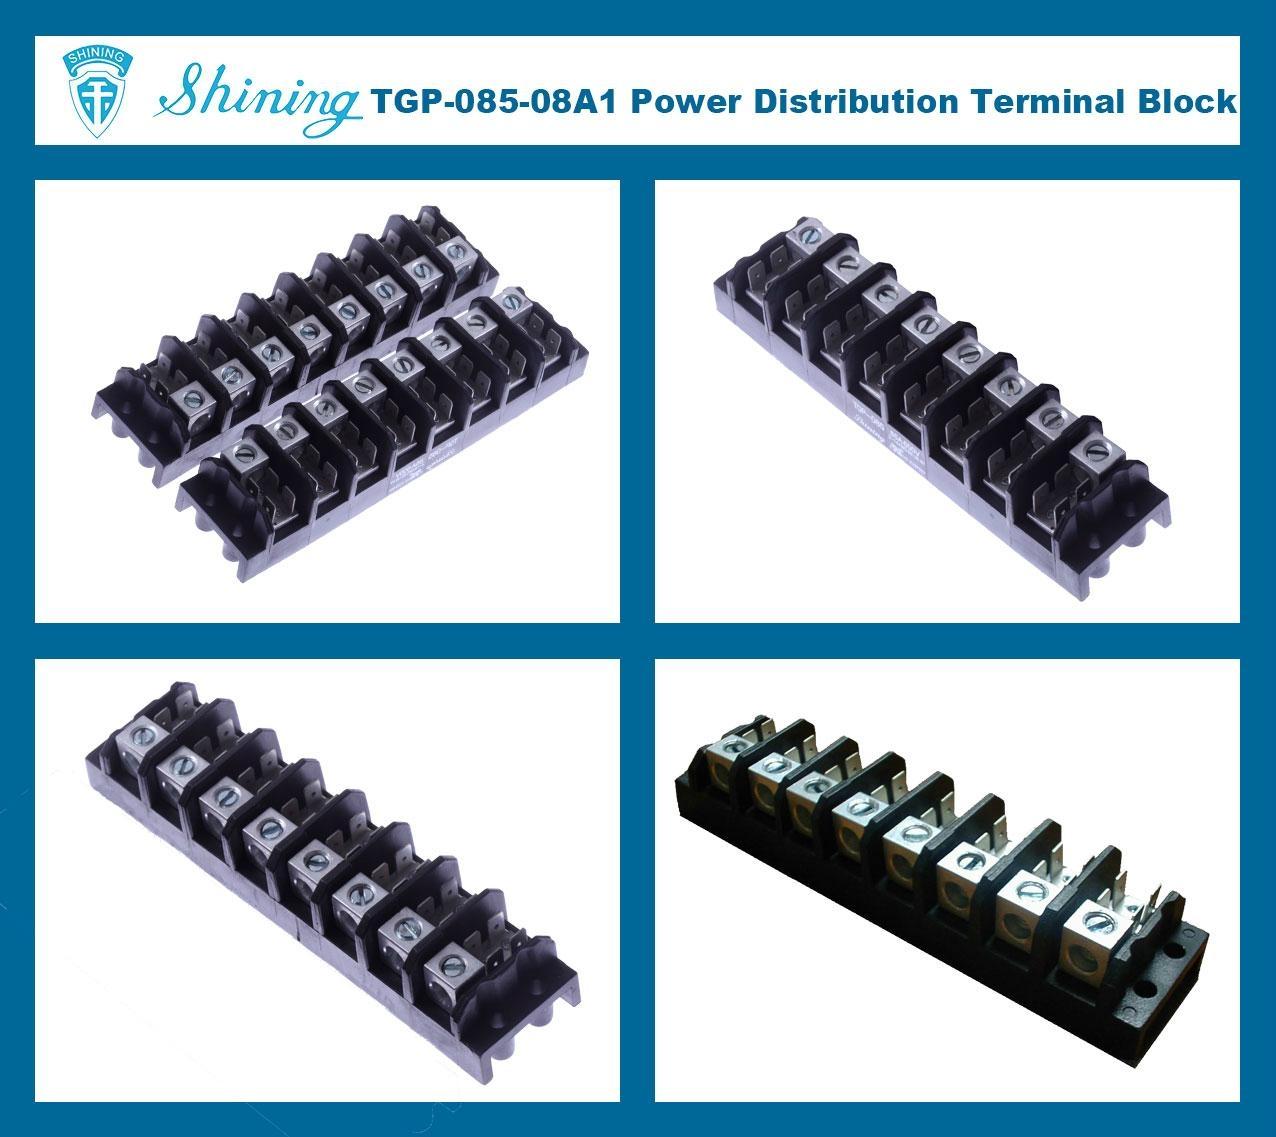 TGP-085-08A 配電端子台 Power Distribution Terminal Block 2